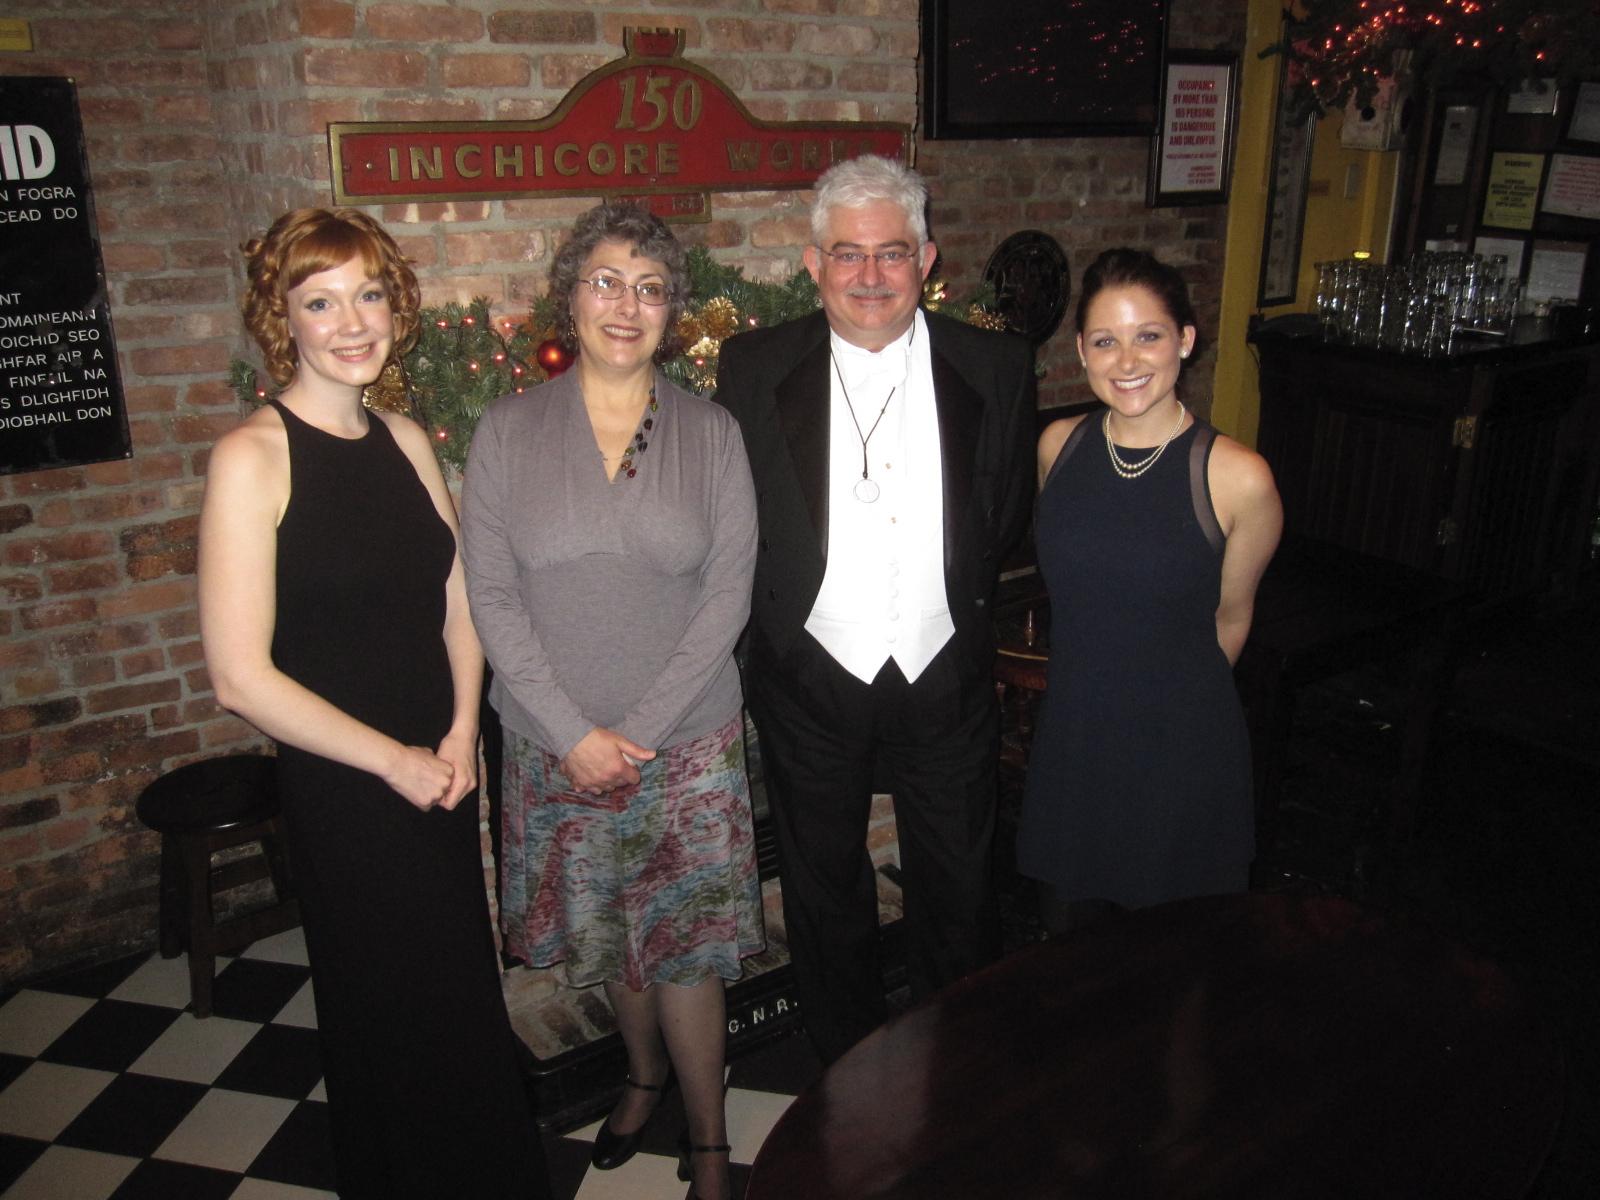 Emily Hockaday, Linda Landrigan, James Lincoln Warren, Jackie Sherbow, 2011